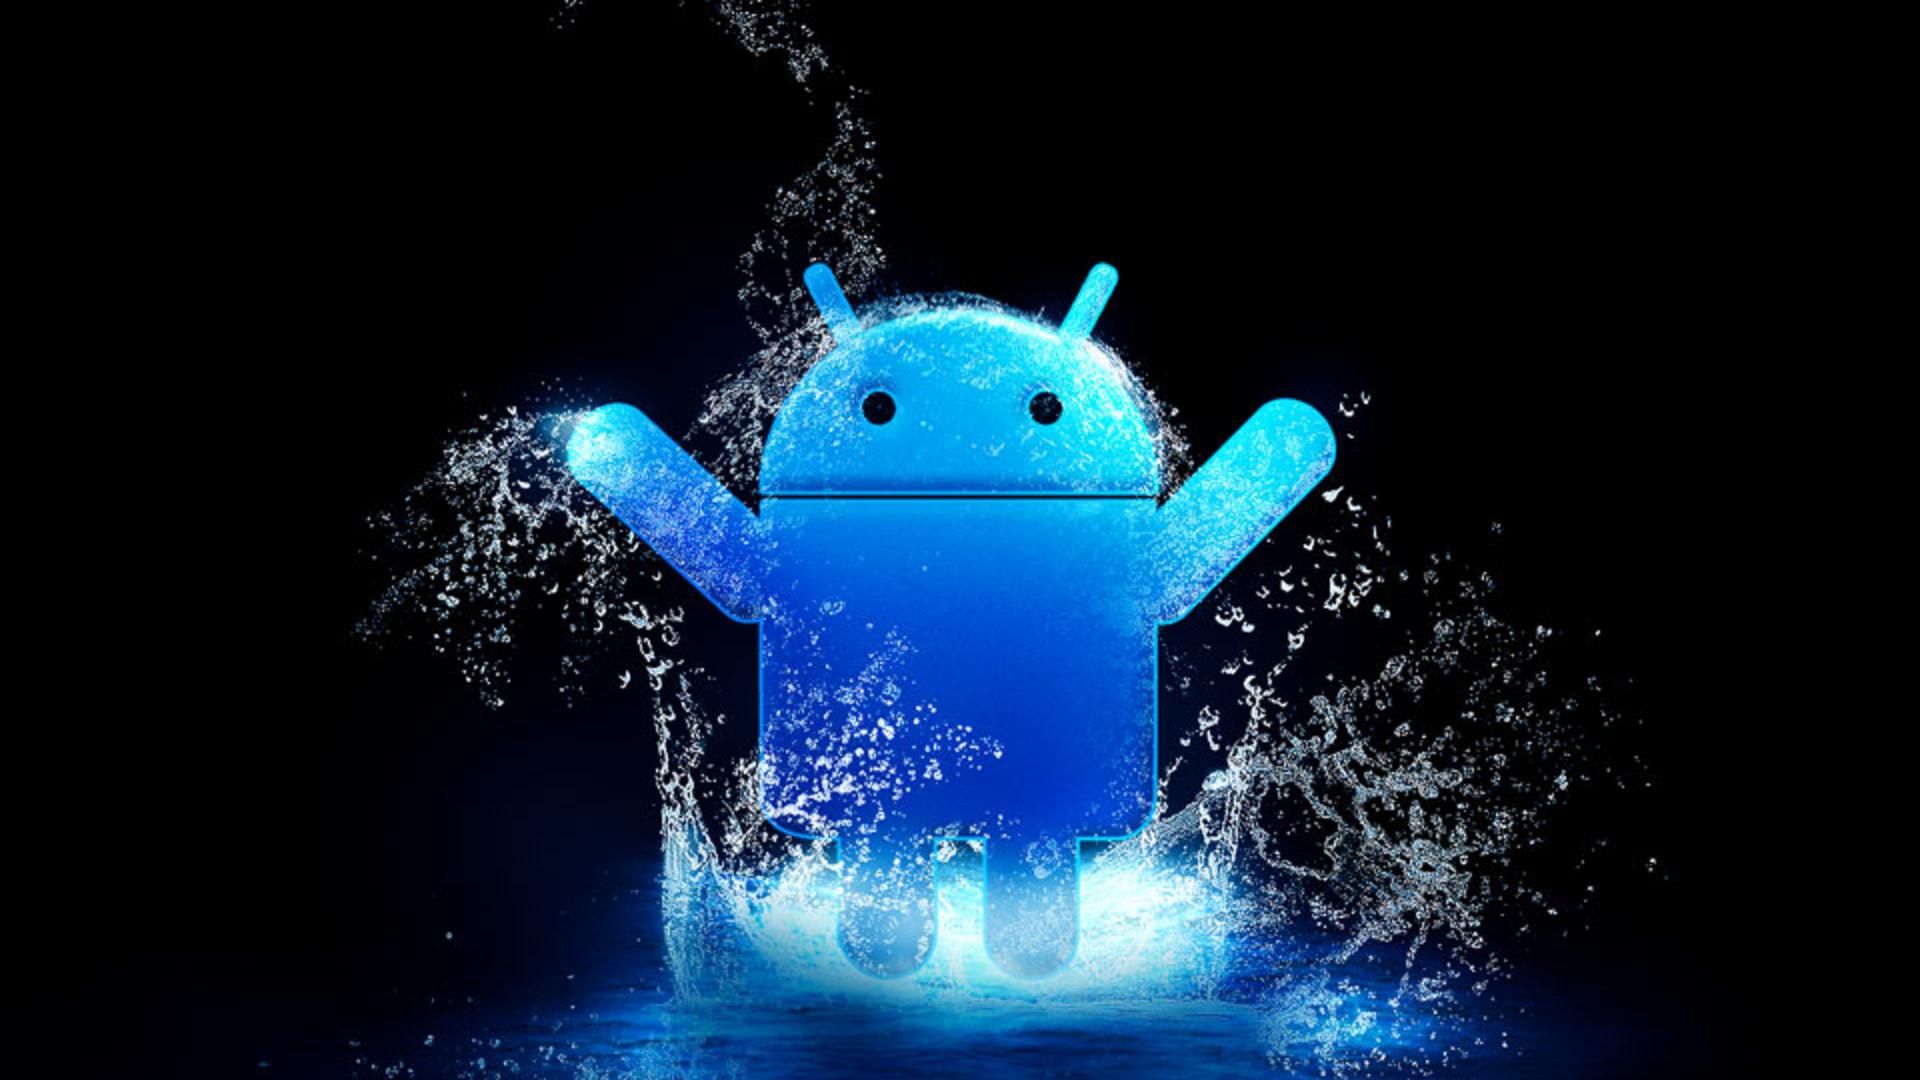 ehvolyuciya-os-android-android-i-bryzgi